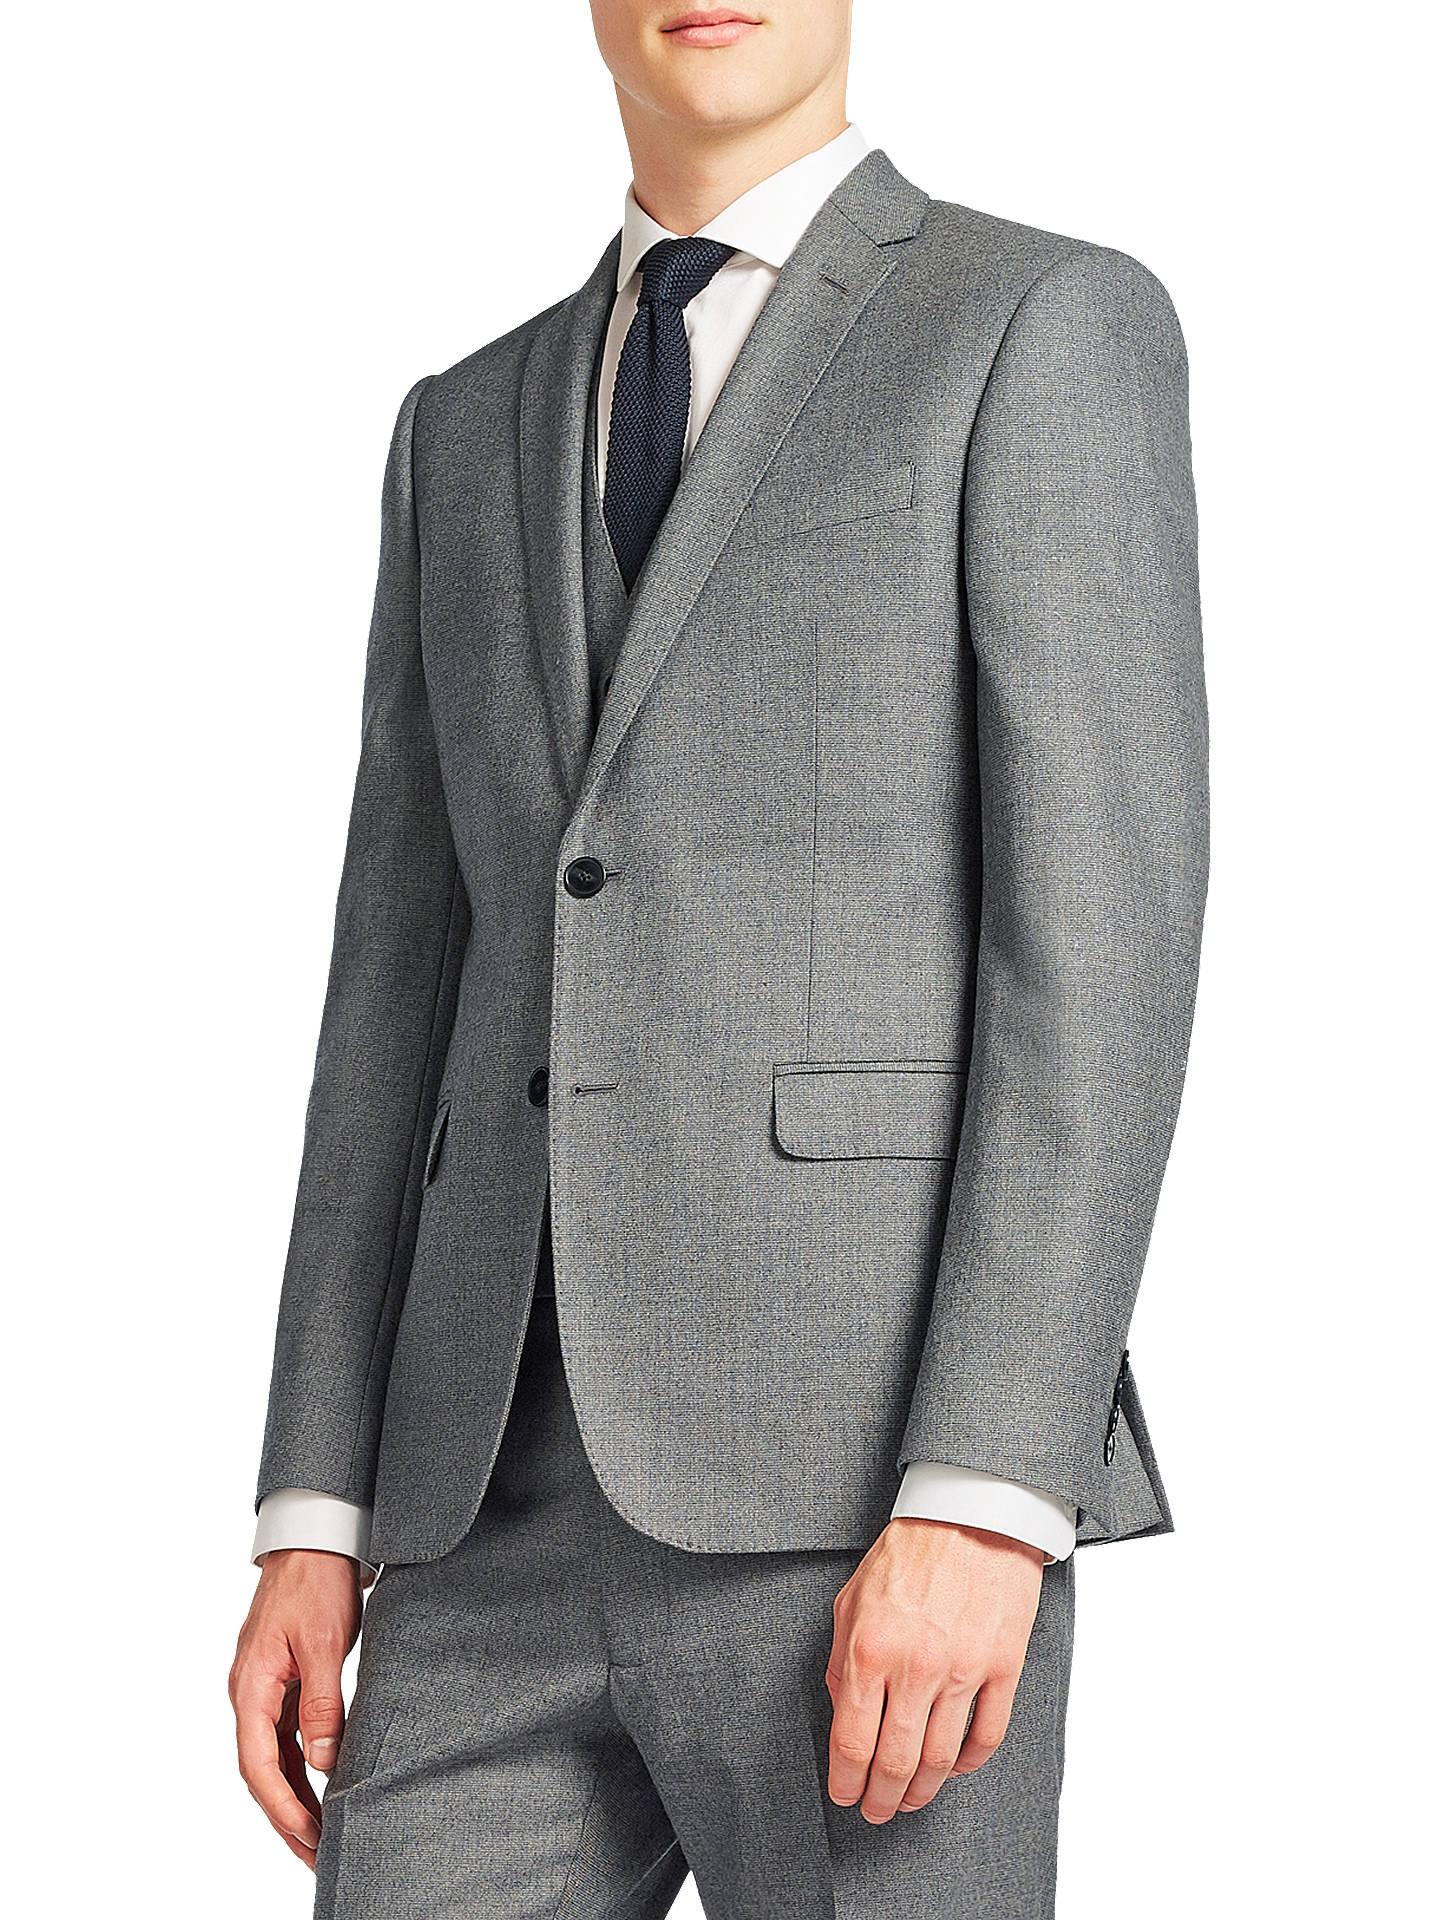 b9f50f1c3a5 Buy Kin Clifton Slim Fit Suit Jacket